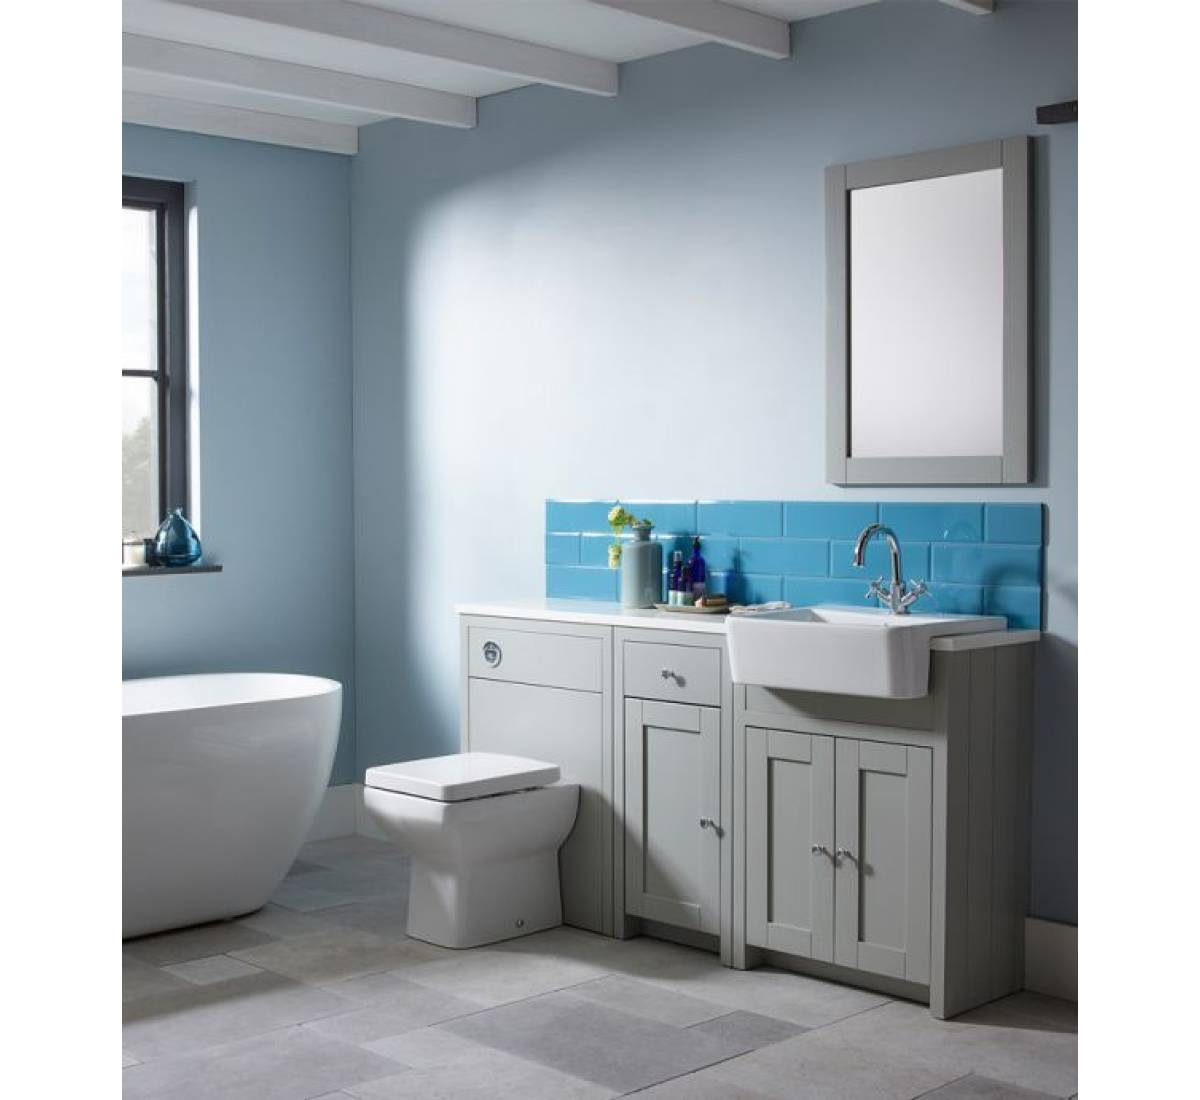 Tavistock Lansdown Fitted Furniture 5 Piece Bathroom Suite Matt Dark for proportions 1200 X 1100